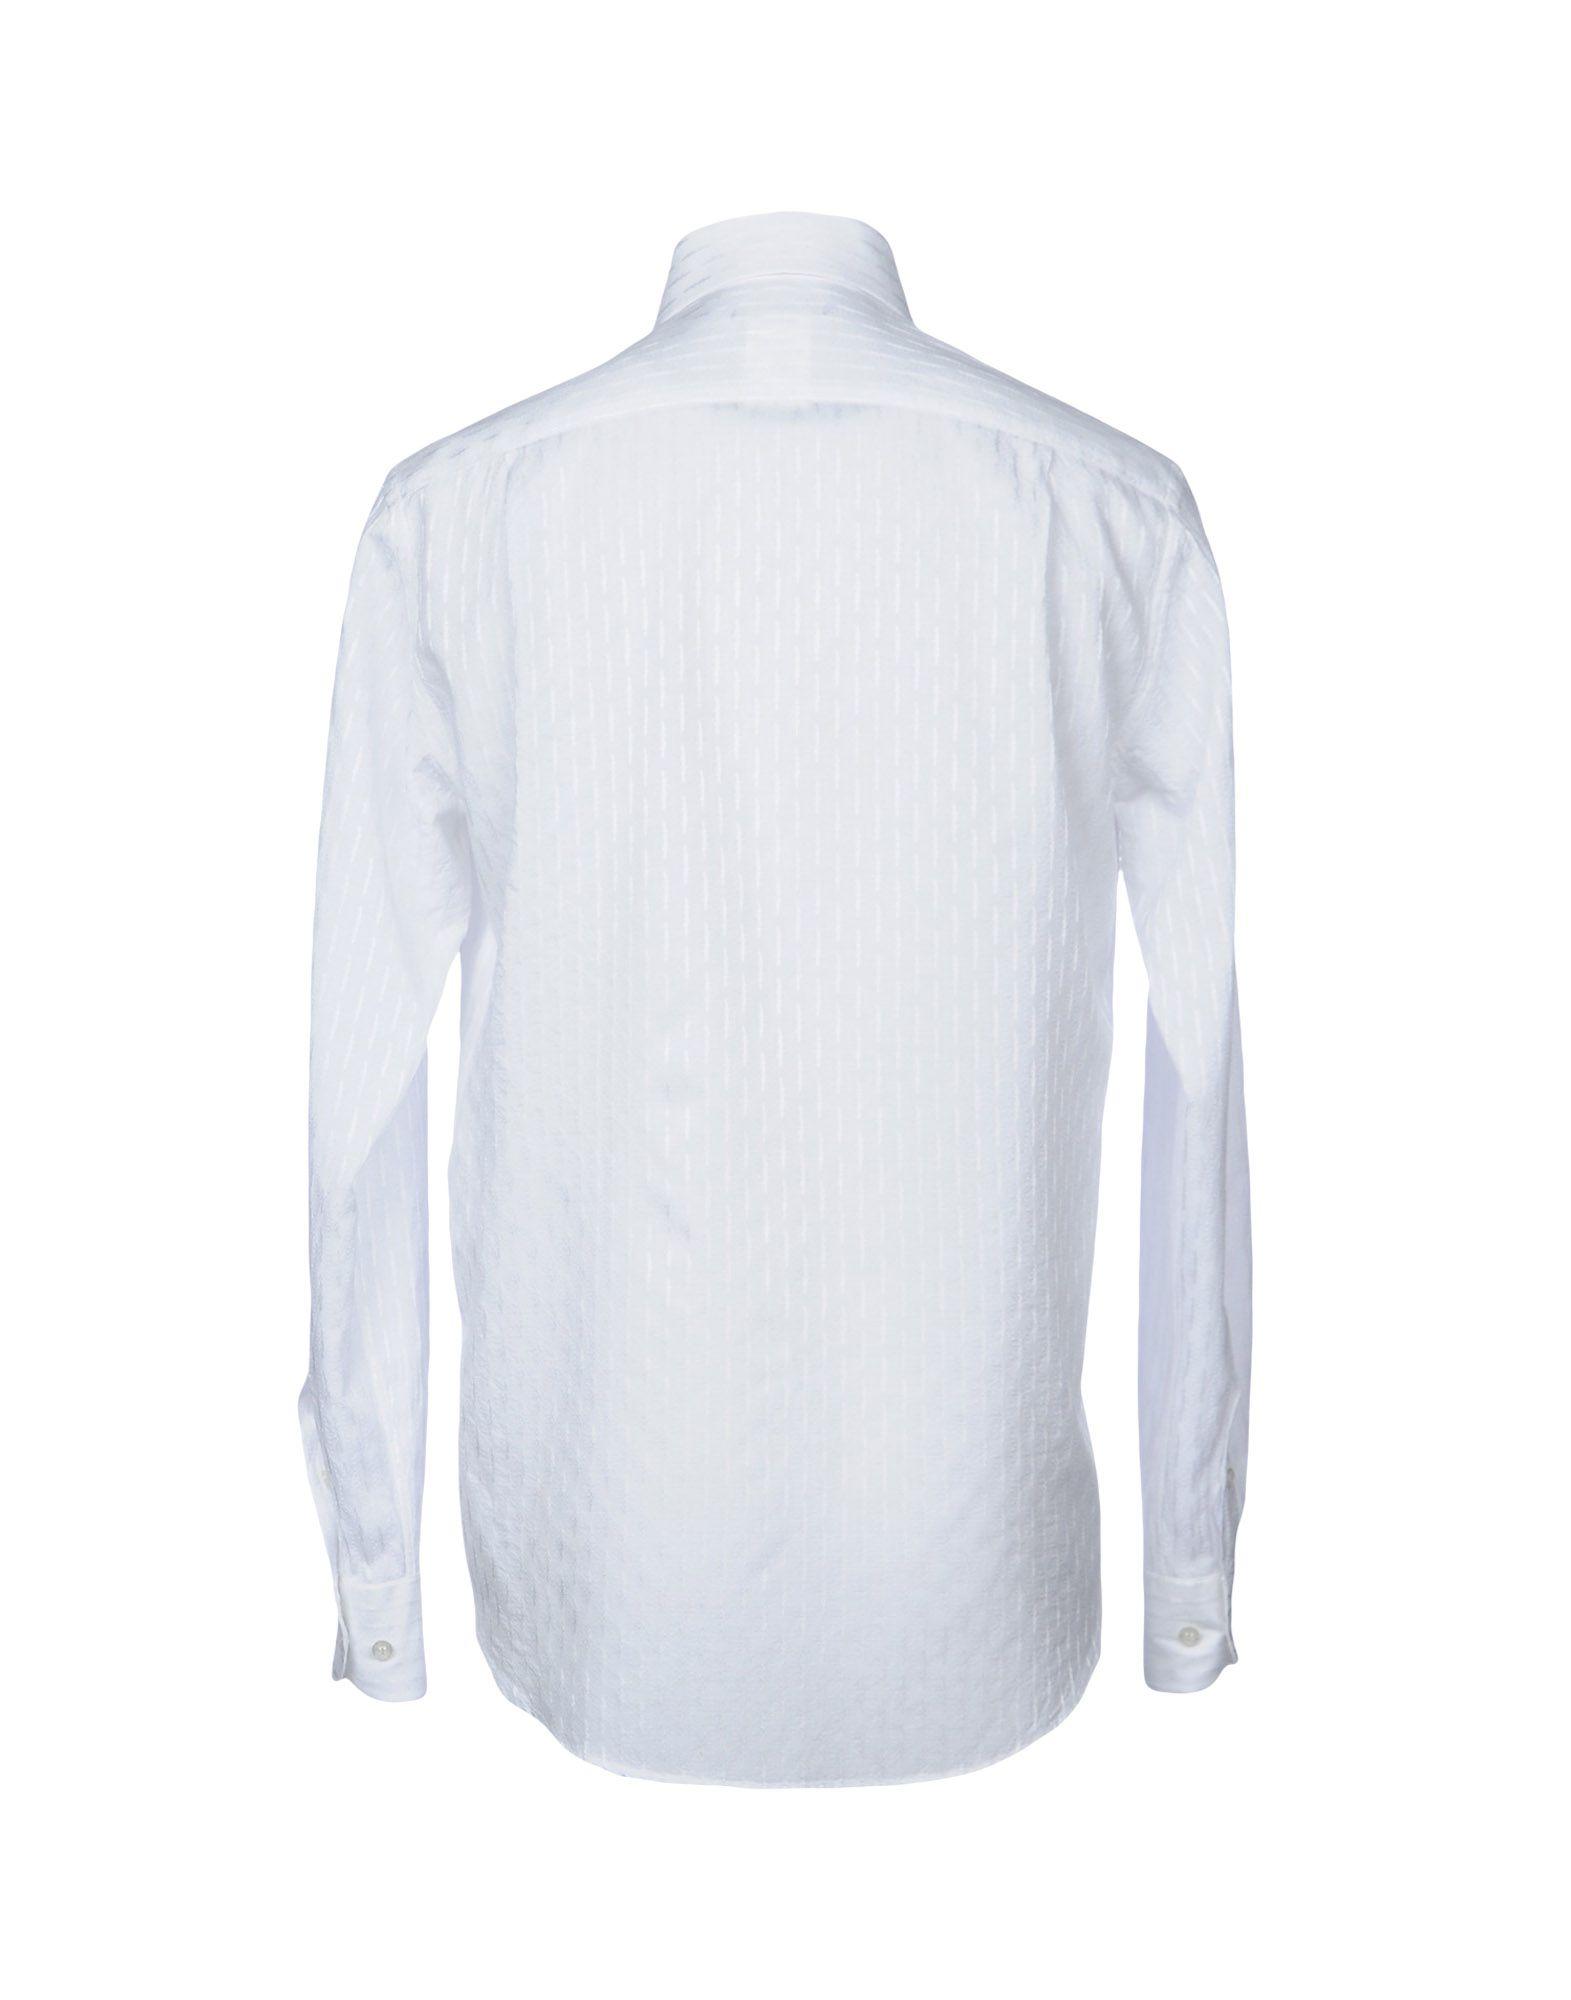 Camicia Tinta Unita Versace Uomo Classic Uomo Versace - 38708832JH d385b4